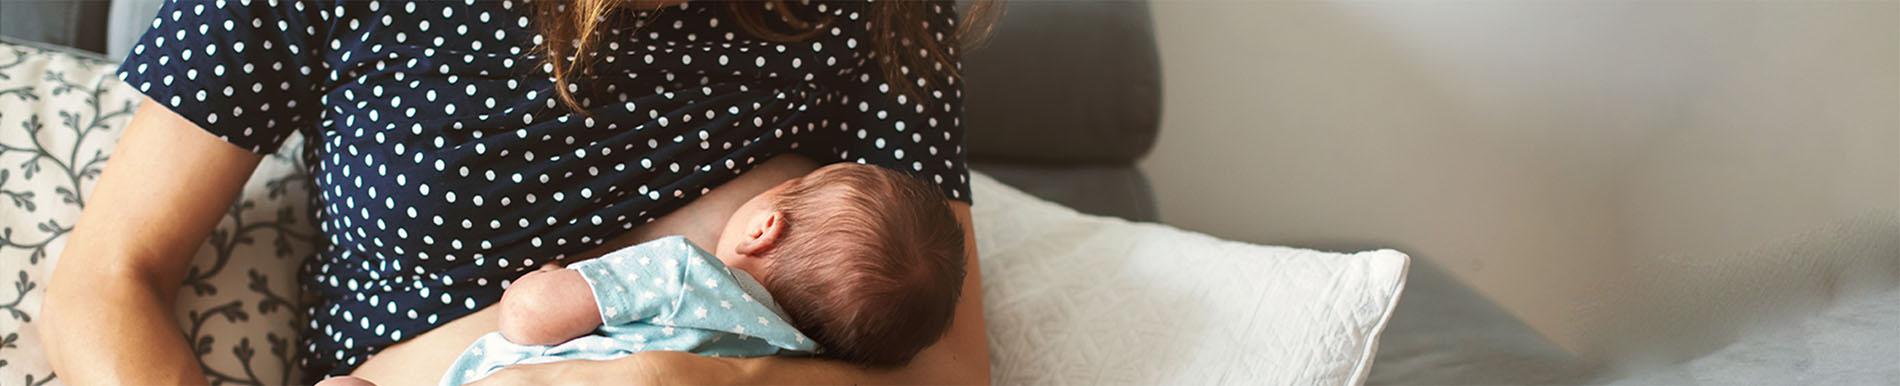 https://www.healthychildren.org/SiteCollectionImage-Homepage-Banners/breastfeeding_hc_home3.jpg